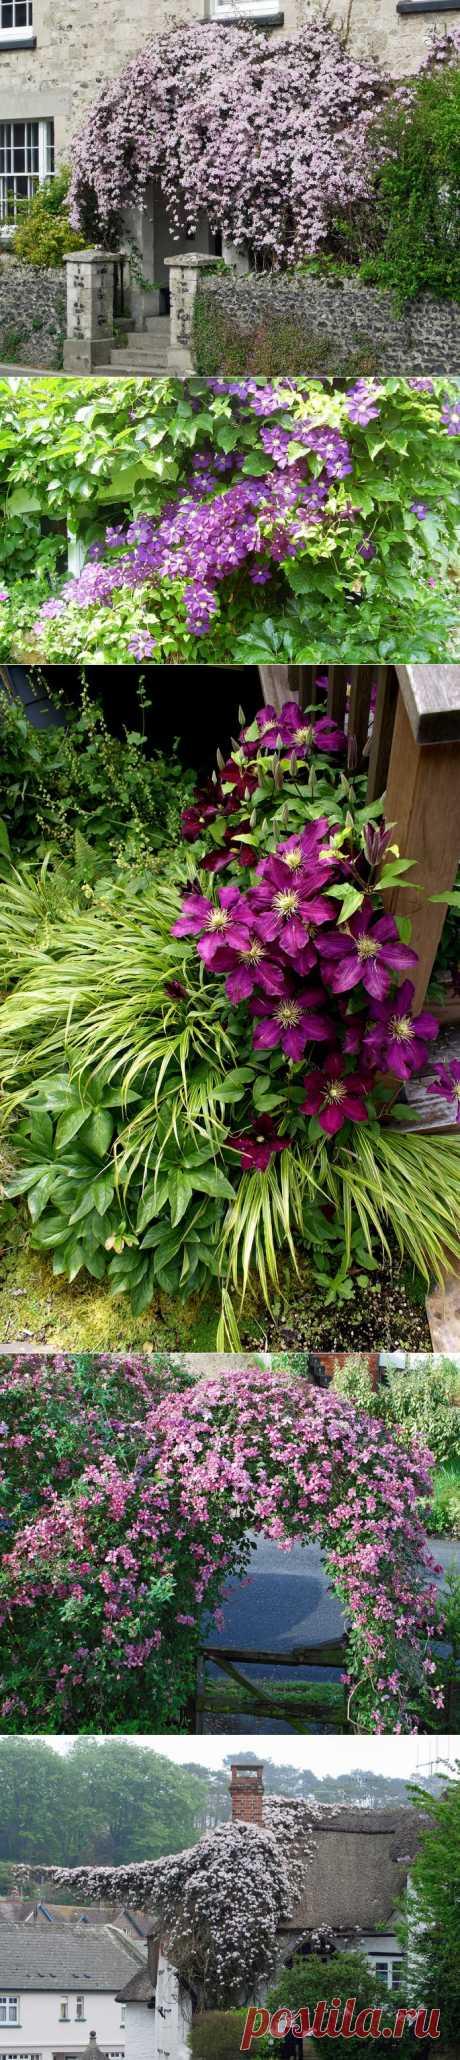 Клематис: цветочный водопад, чарующий взор